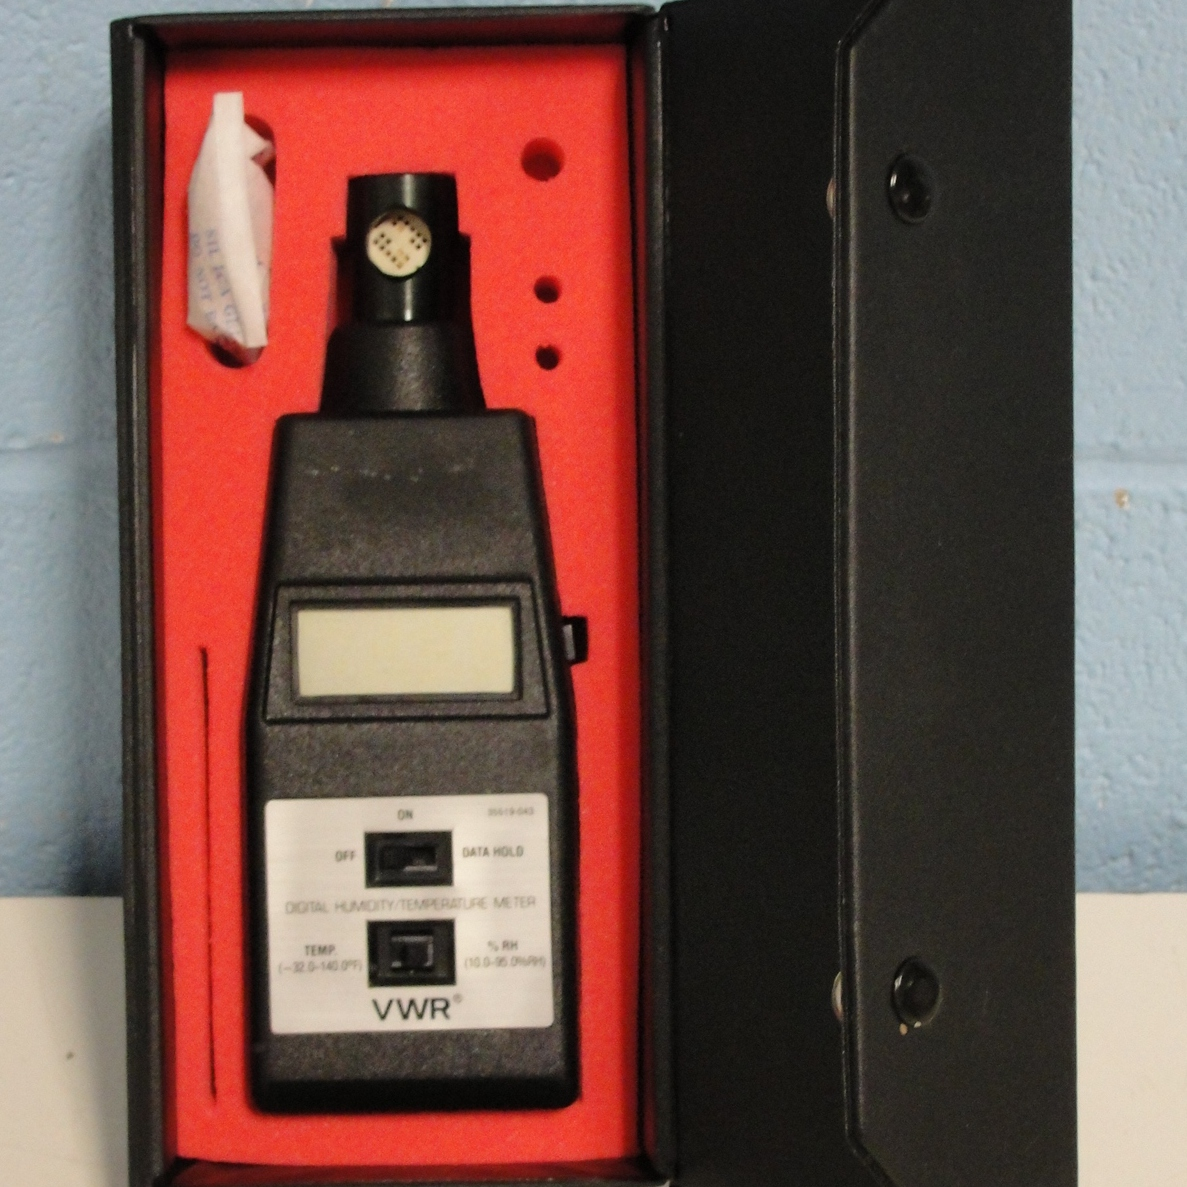 VWR Digital Hygrometer/Thermometer Image